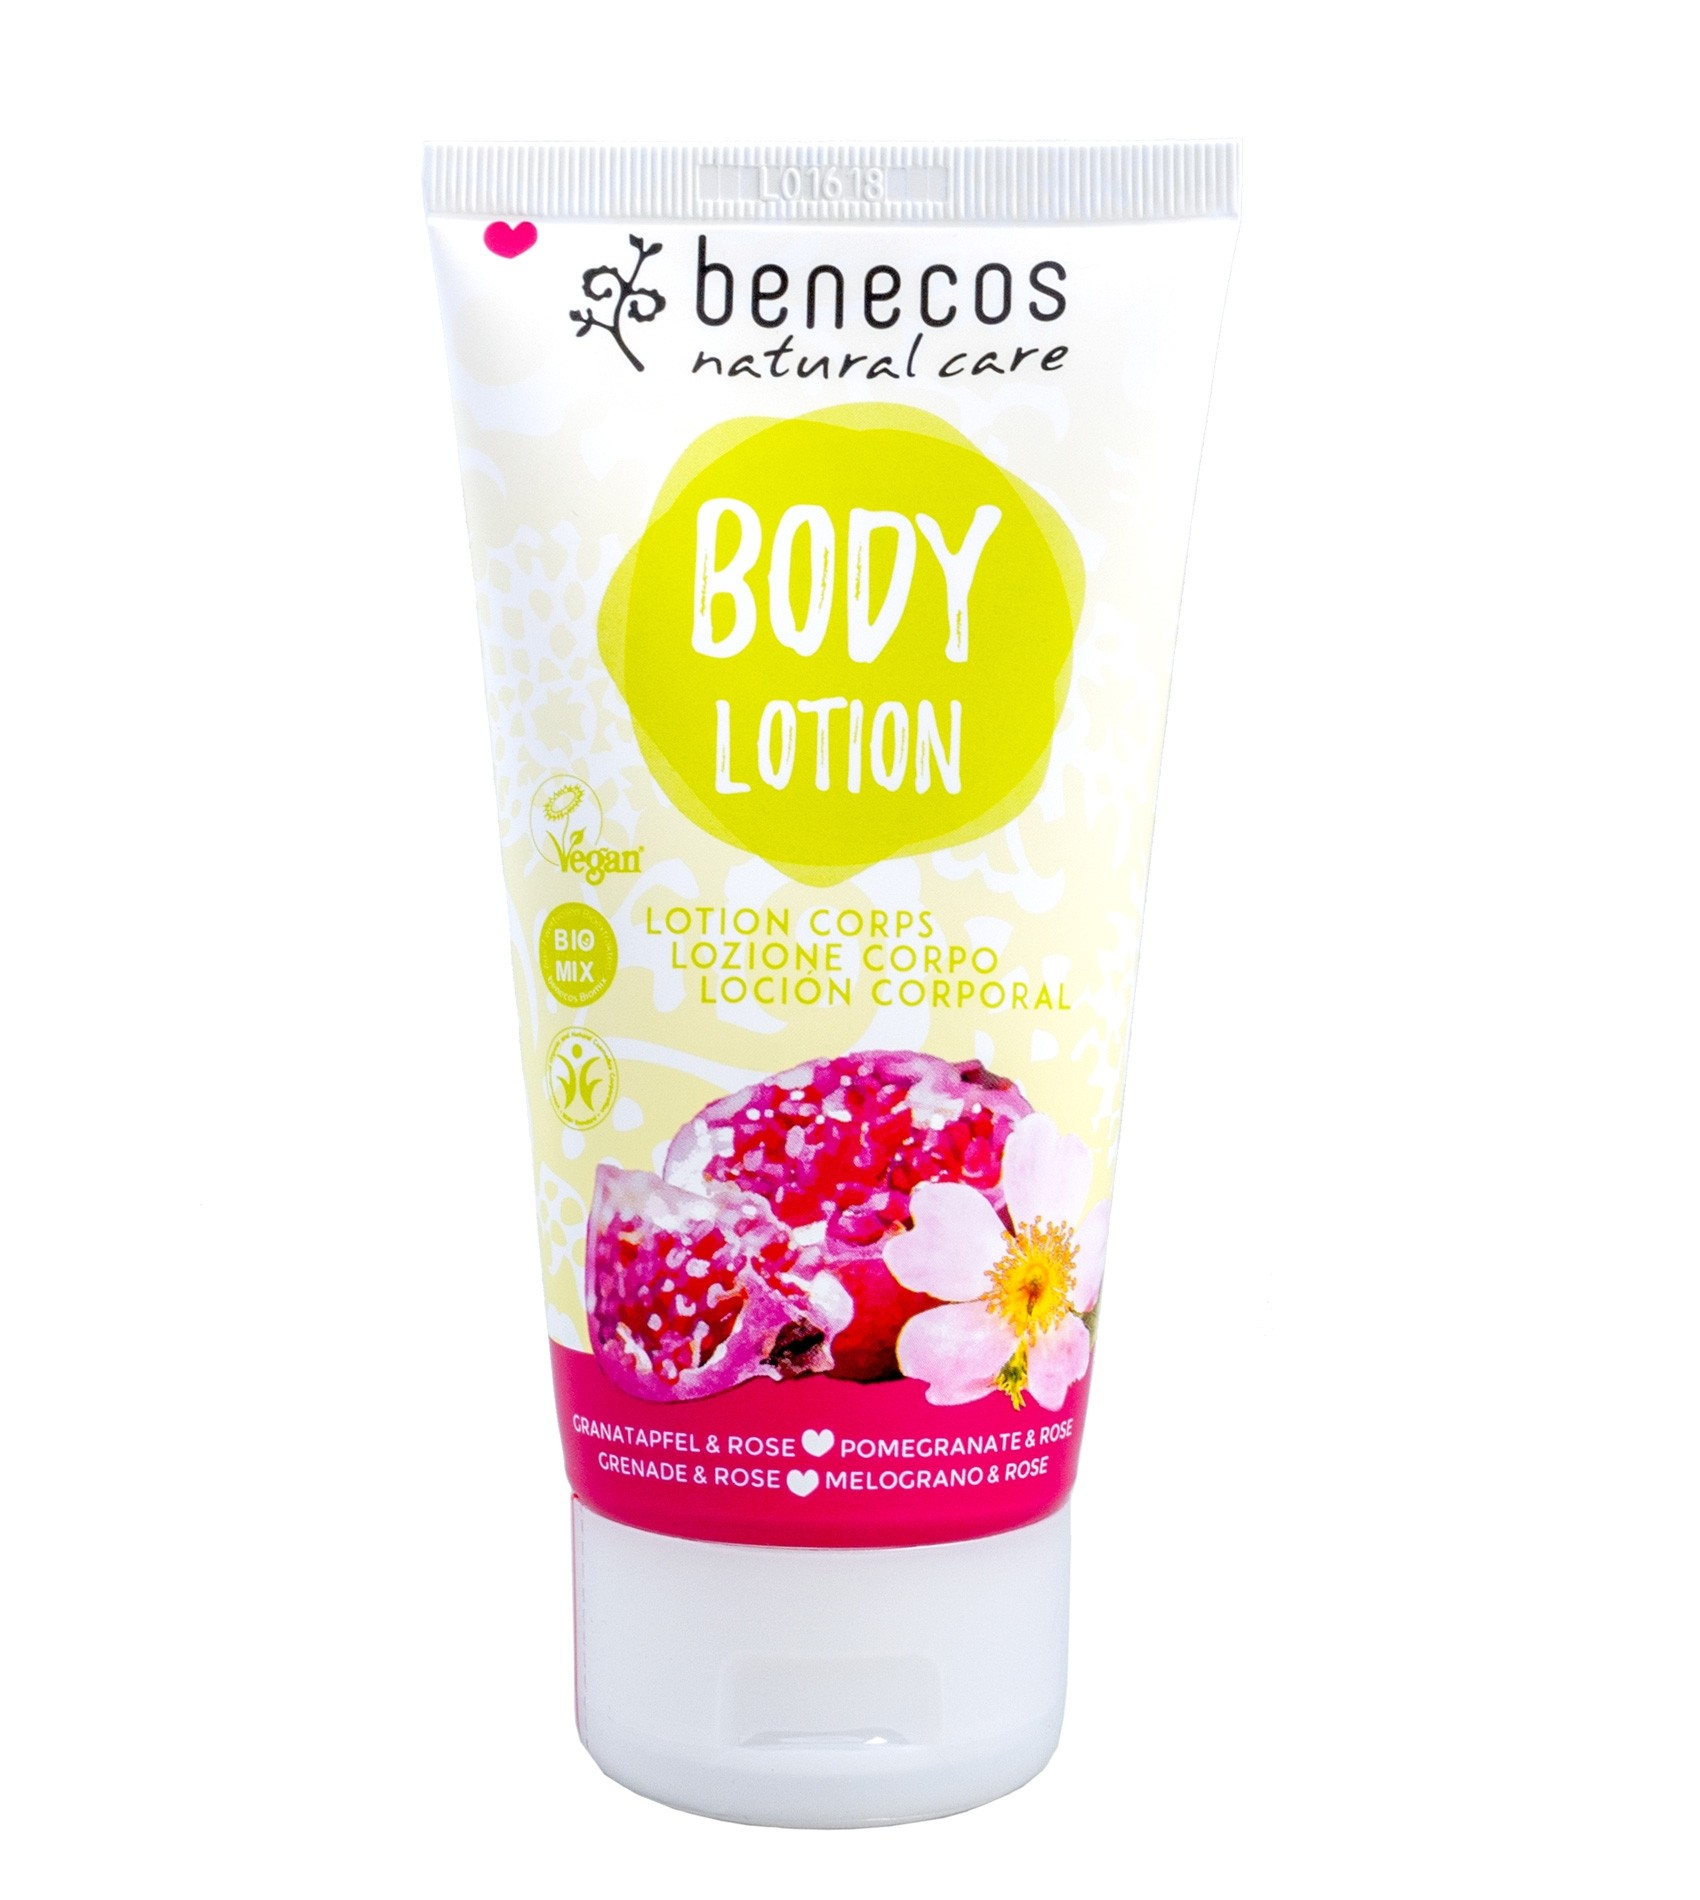 Benecos Vegan Pomegranate & Rose Body Lotion